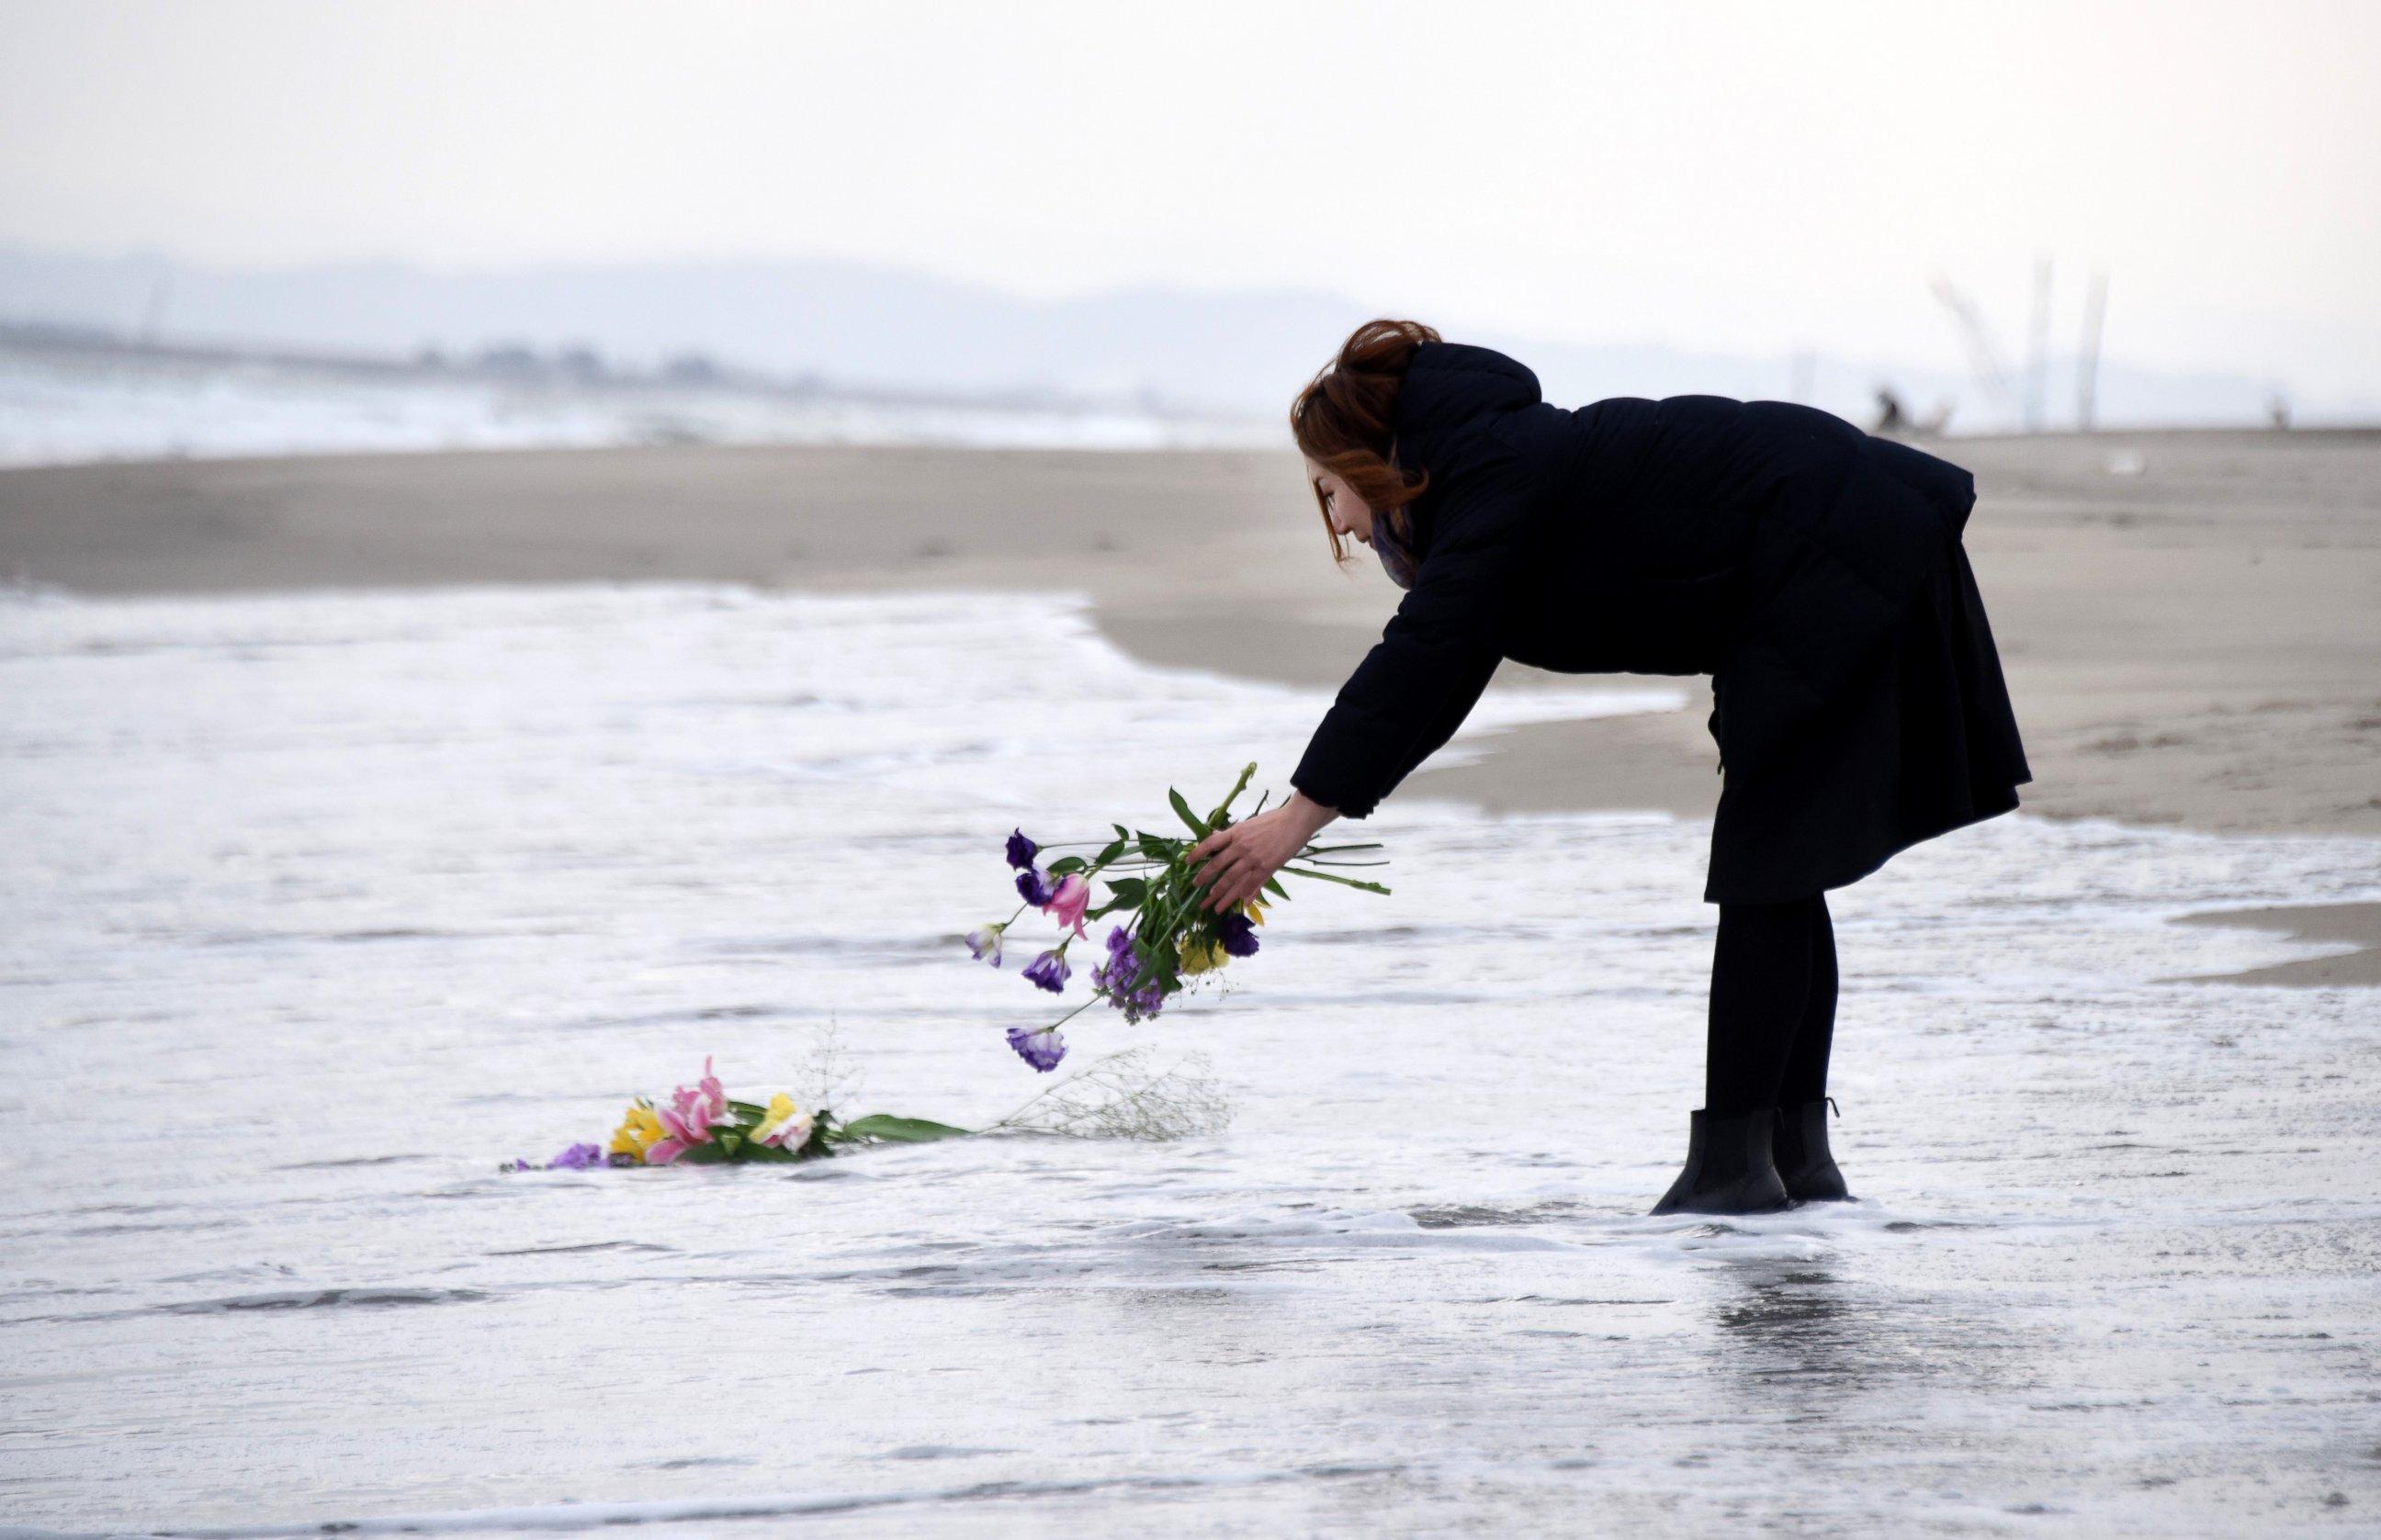 Japan Tsunami Videos at ABC News Video Archive at abcnews.com